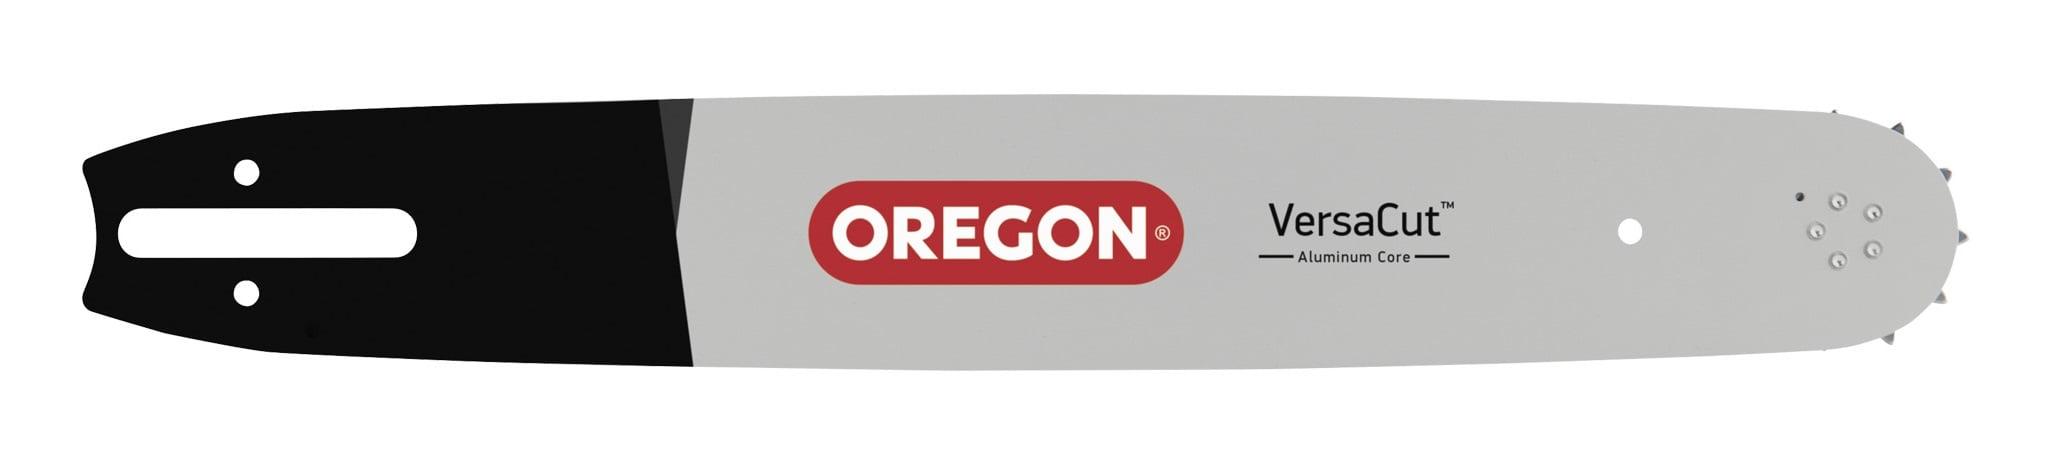 O188VXLHD009 Sina Oregon 45 cm 3/8 1,5 mm VersaCut